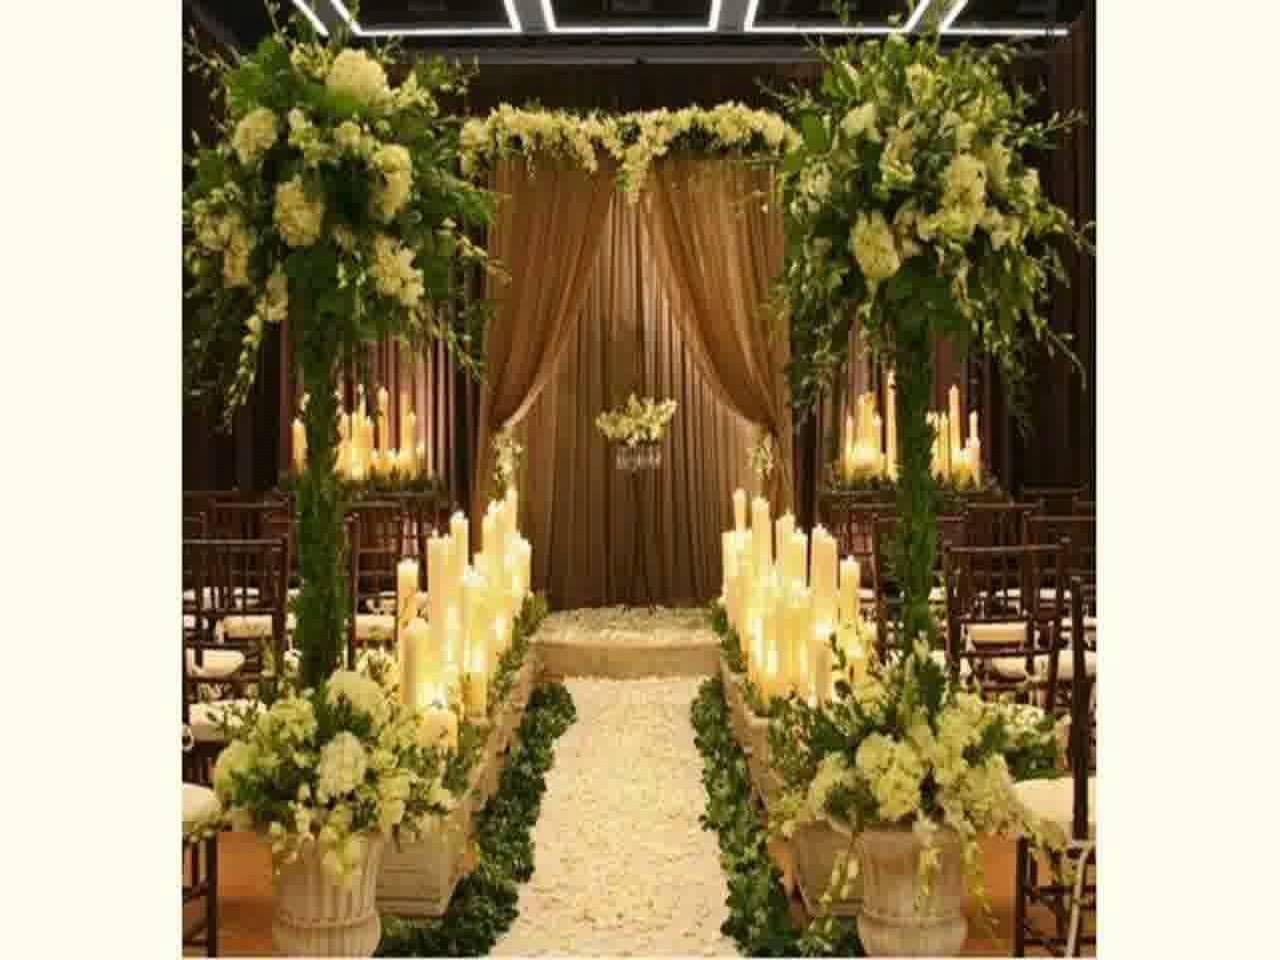 Decor ideas for wedding  church wedding reception photos   Yahoo Image Search Results